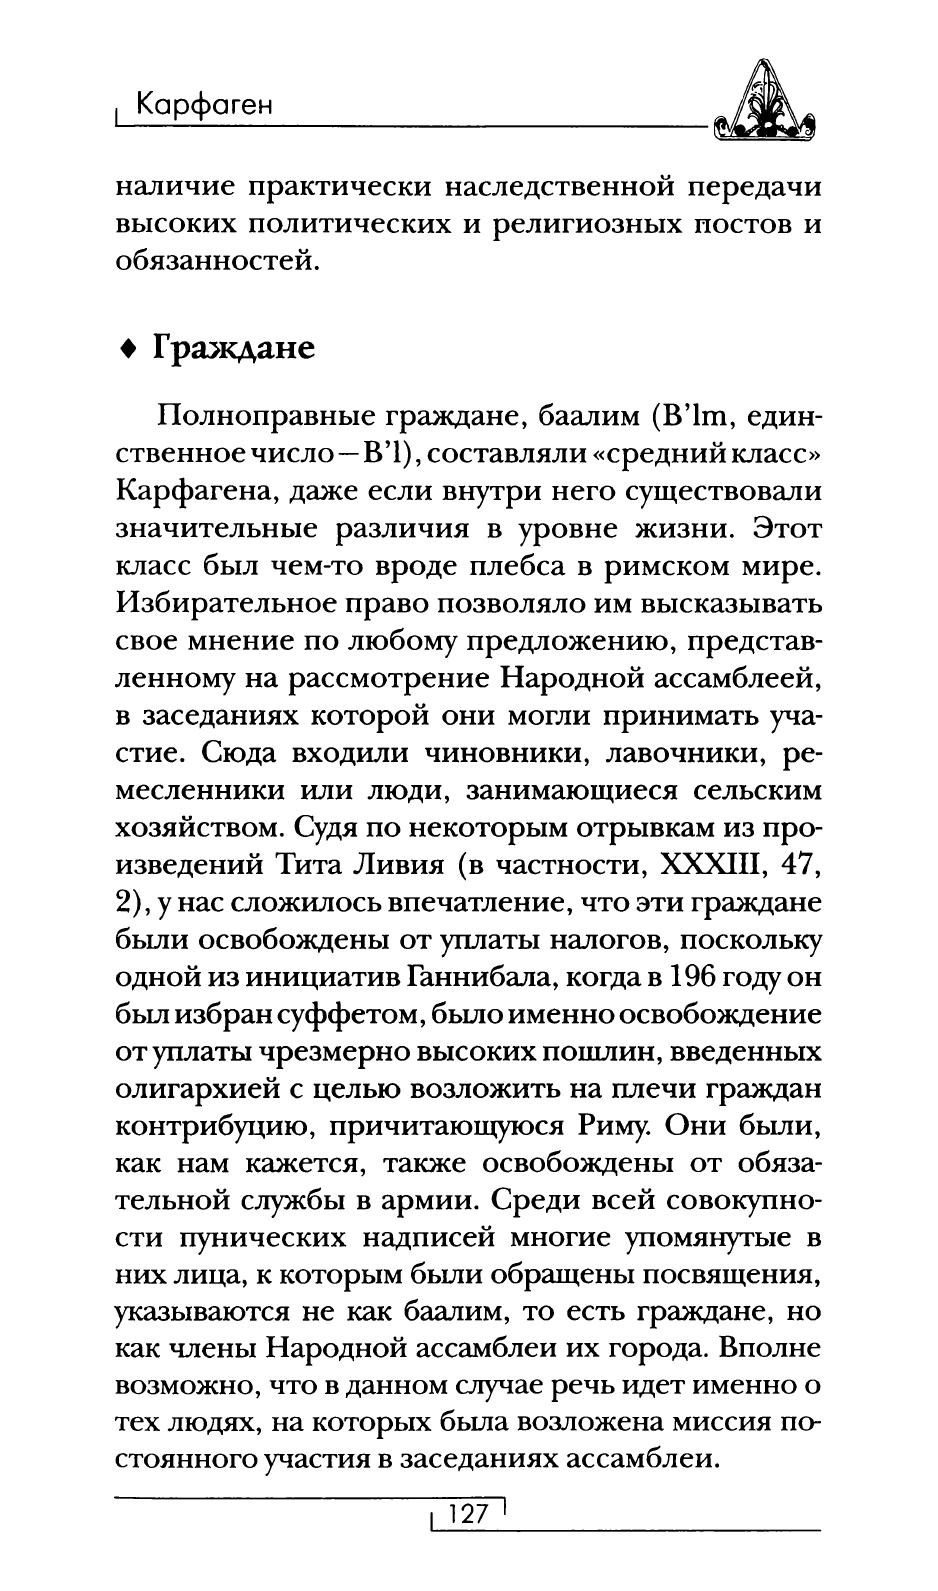 http://i3.imageban.ru/out/2014/01/14/7aafeb073816855b77abdf3896379271.jpg